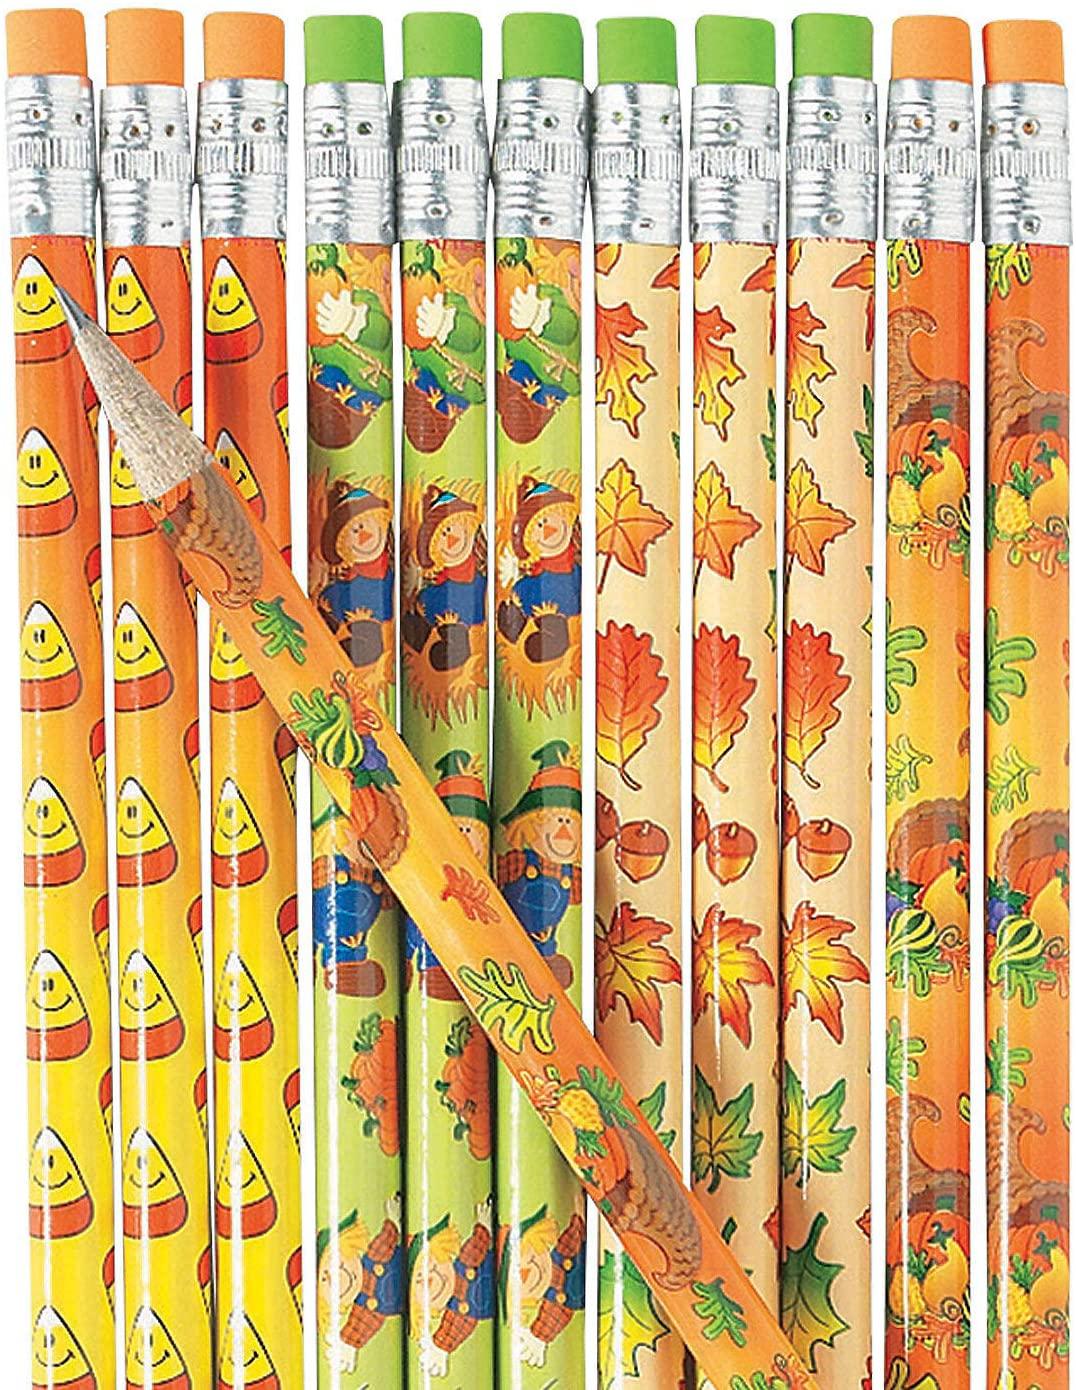 Fall Pencil Assortment (144 bulk pencil set) Fall Stationery